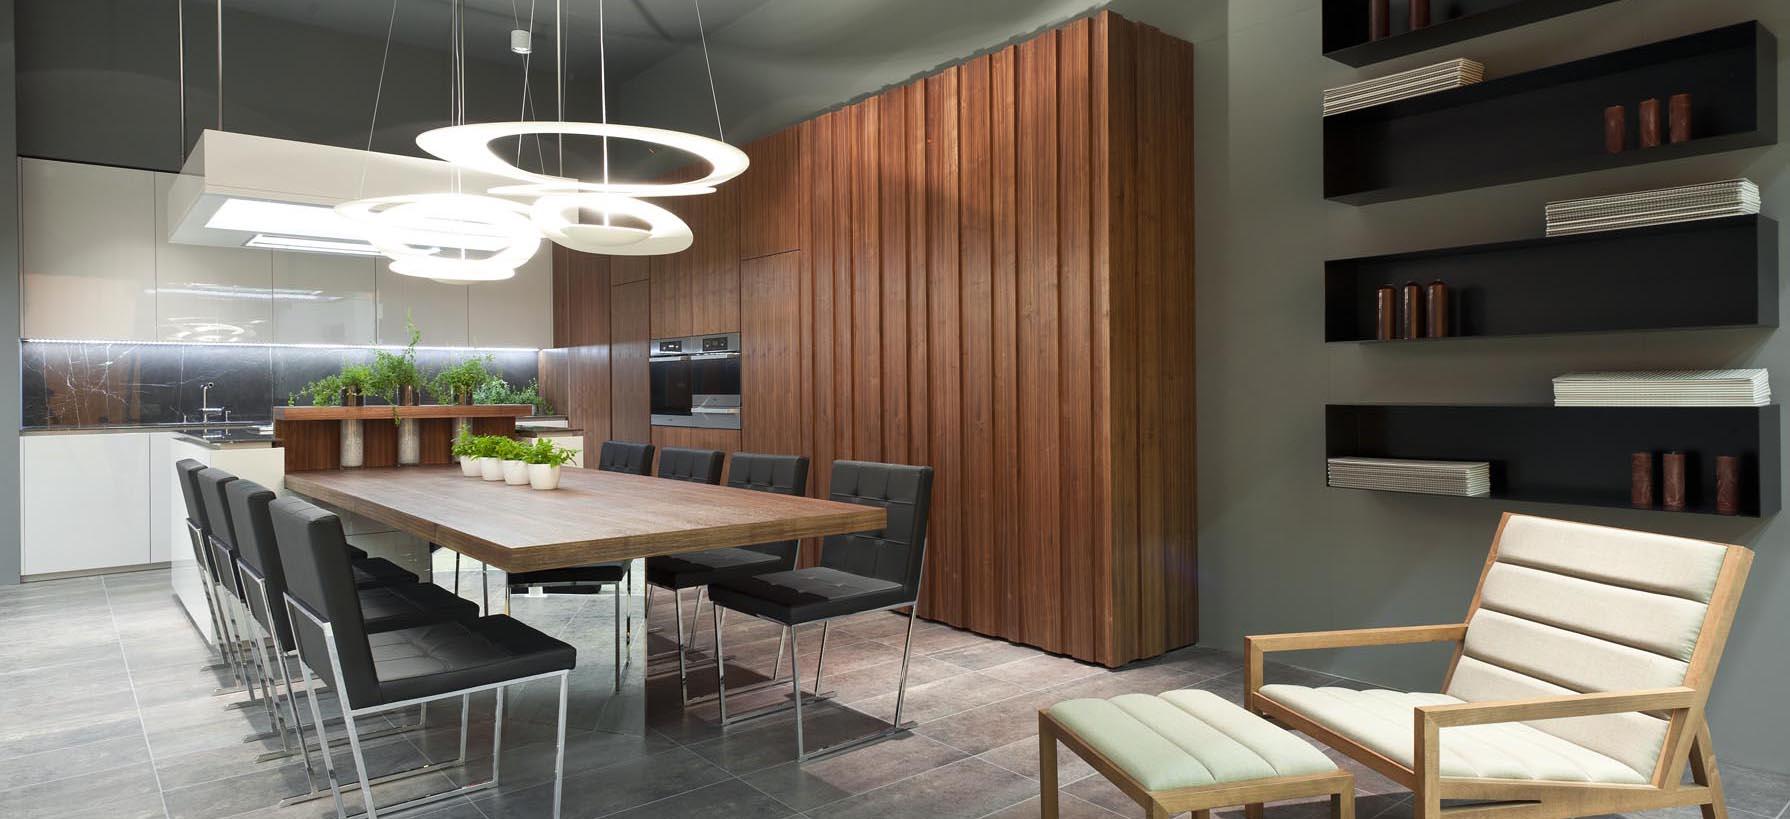 Kuhinjski interier